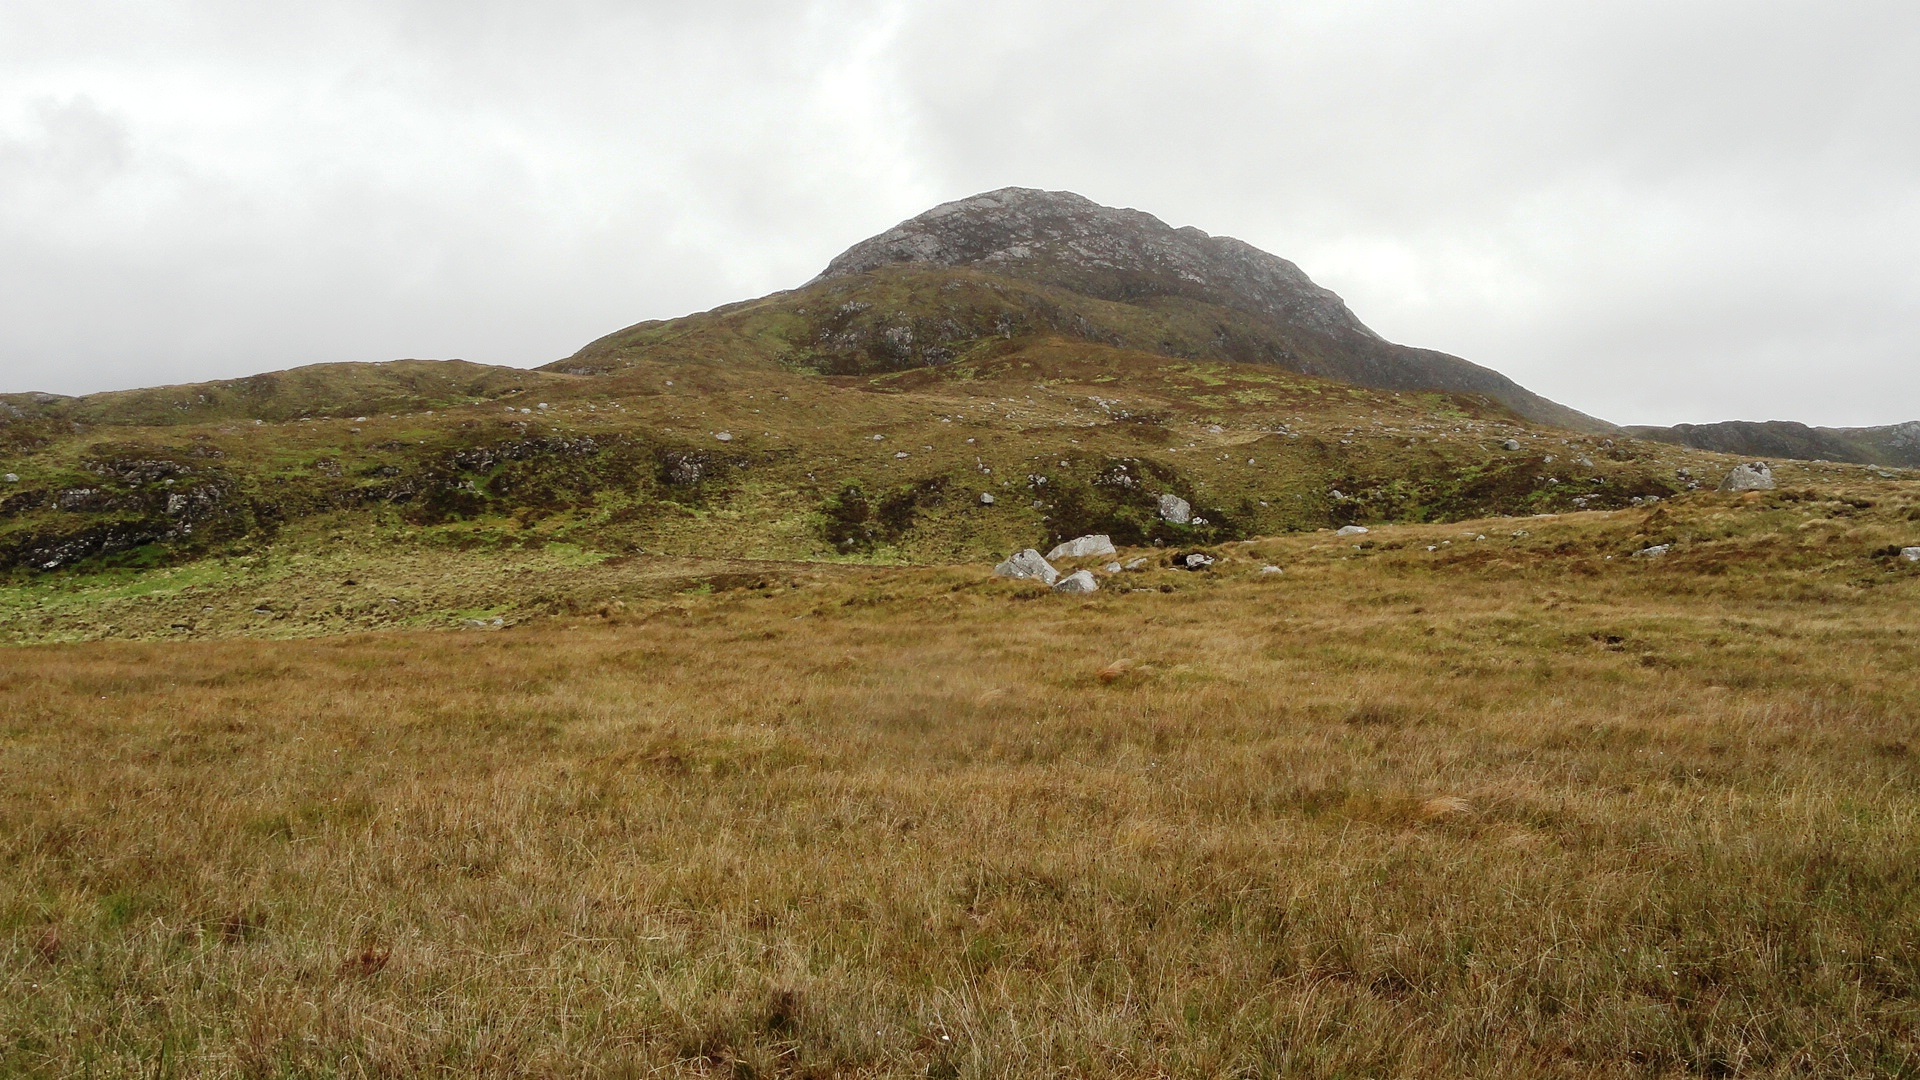 Parc National du Connemara - Diamond Hill